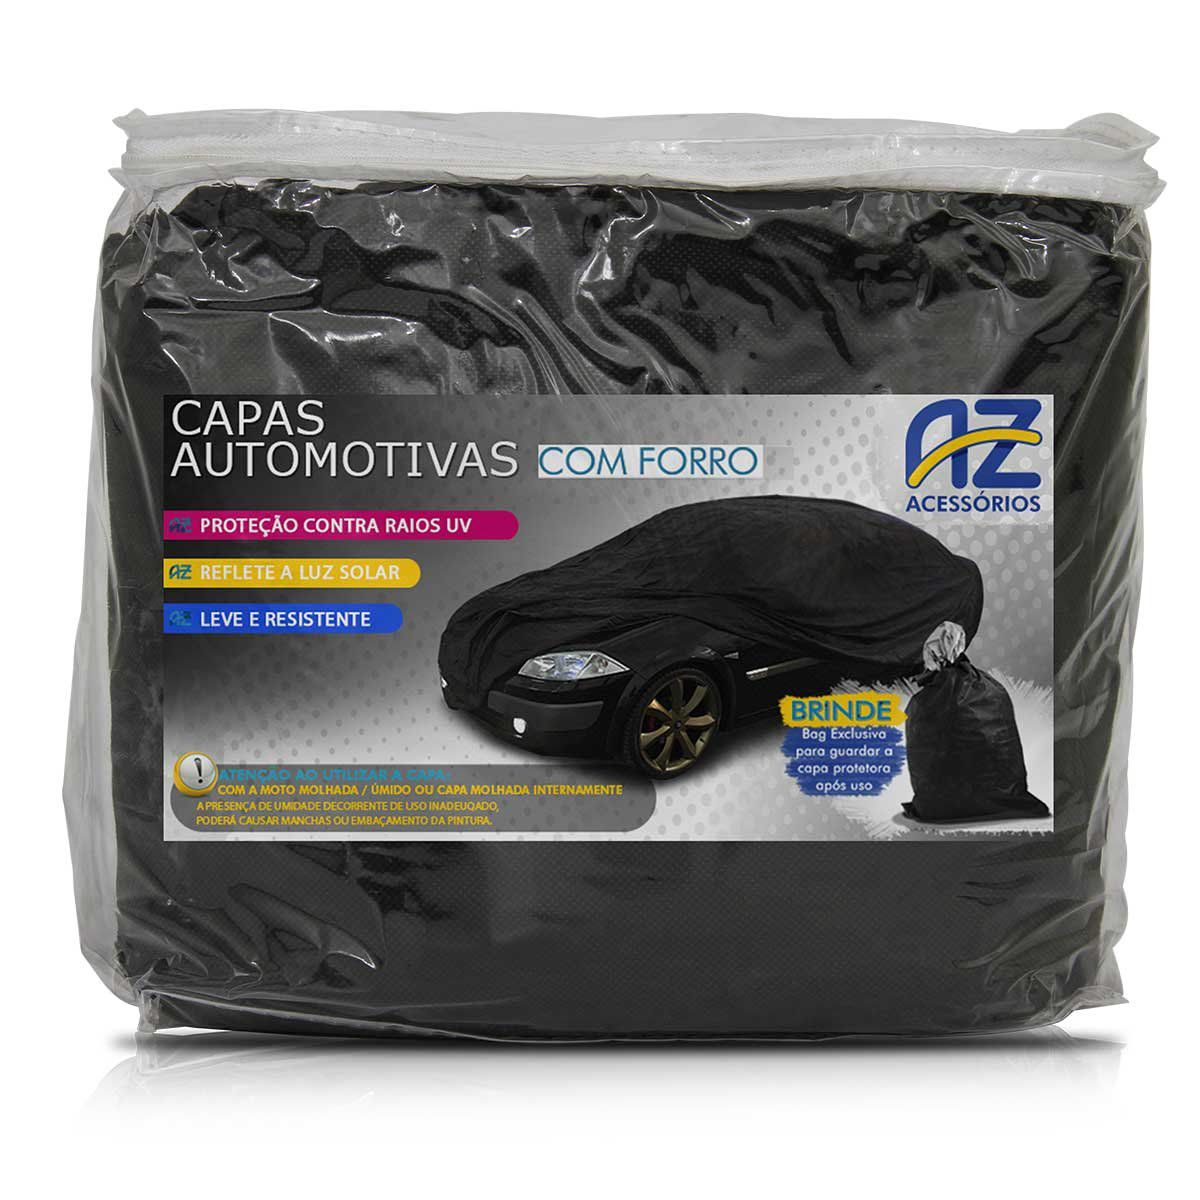 d78c39f4006 Capa para Cobrir Carro Tnt Anti Poeira P M G - AZ Acessórios